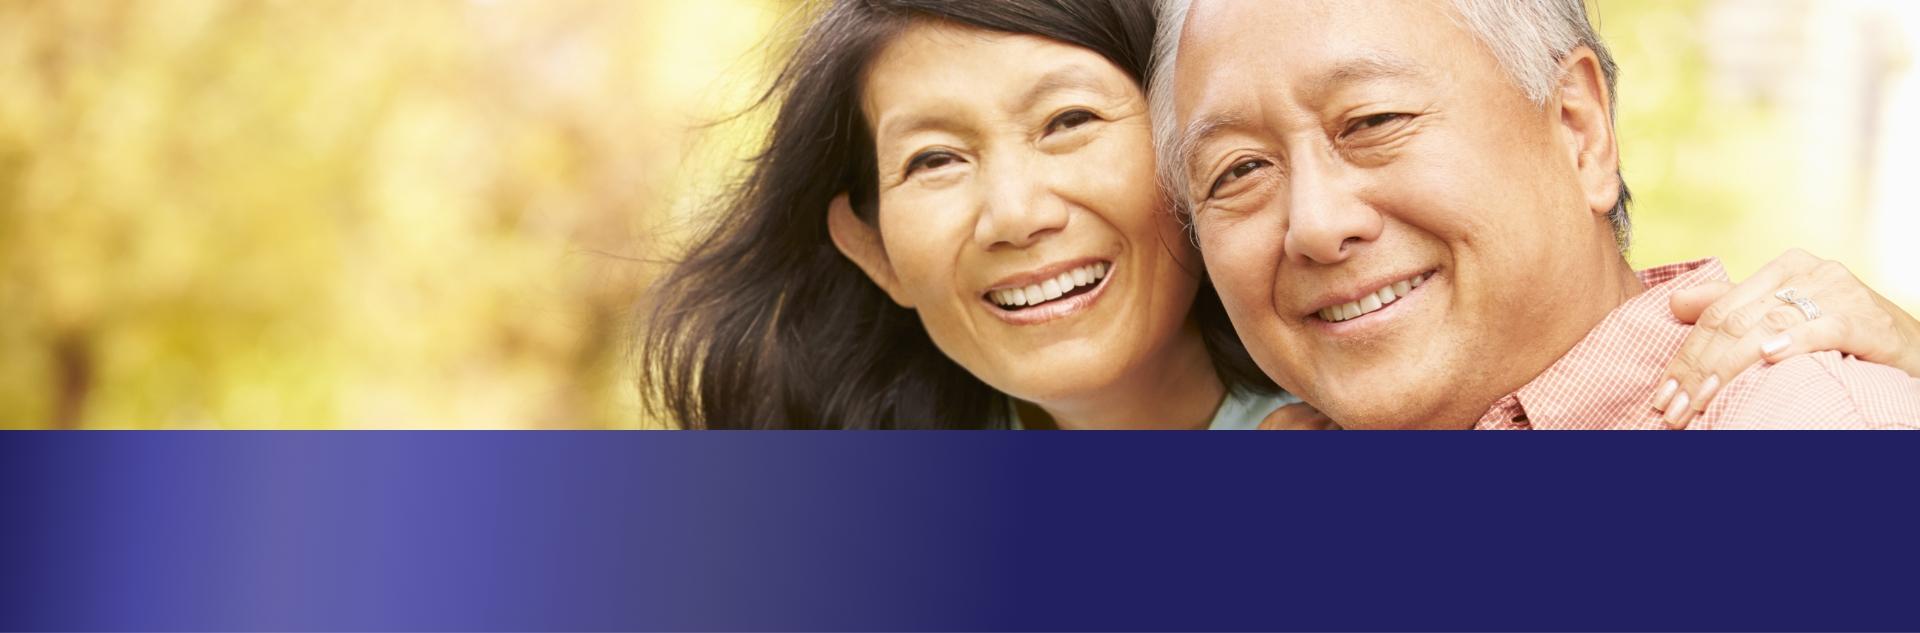 Endodontic Consultants of San Antonio - Blog